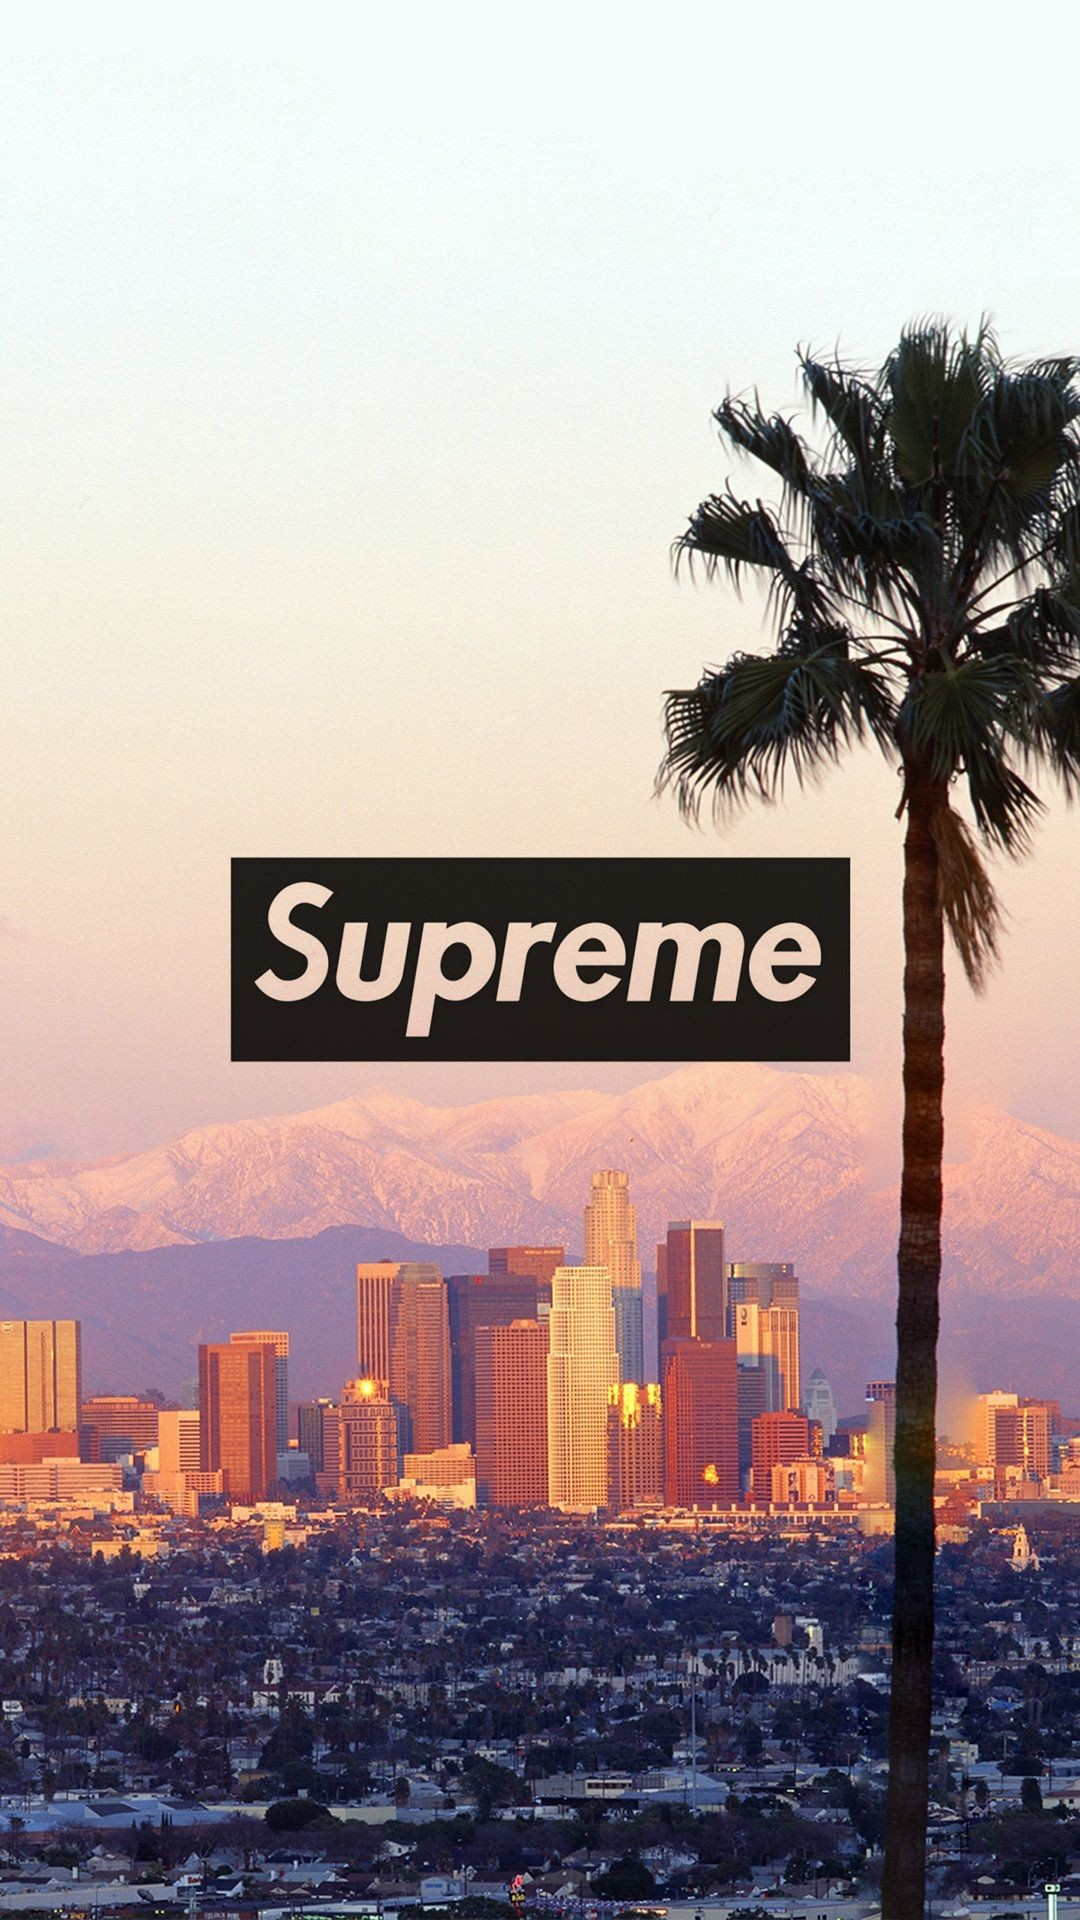 1080x1920, Supreme Los Angeles - Supreme Wallpaper Iphone - HD Wallpaper